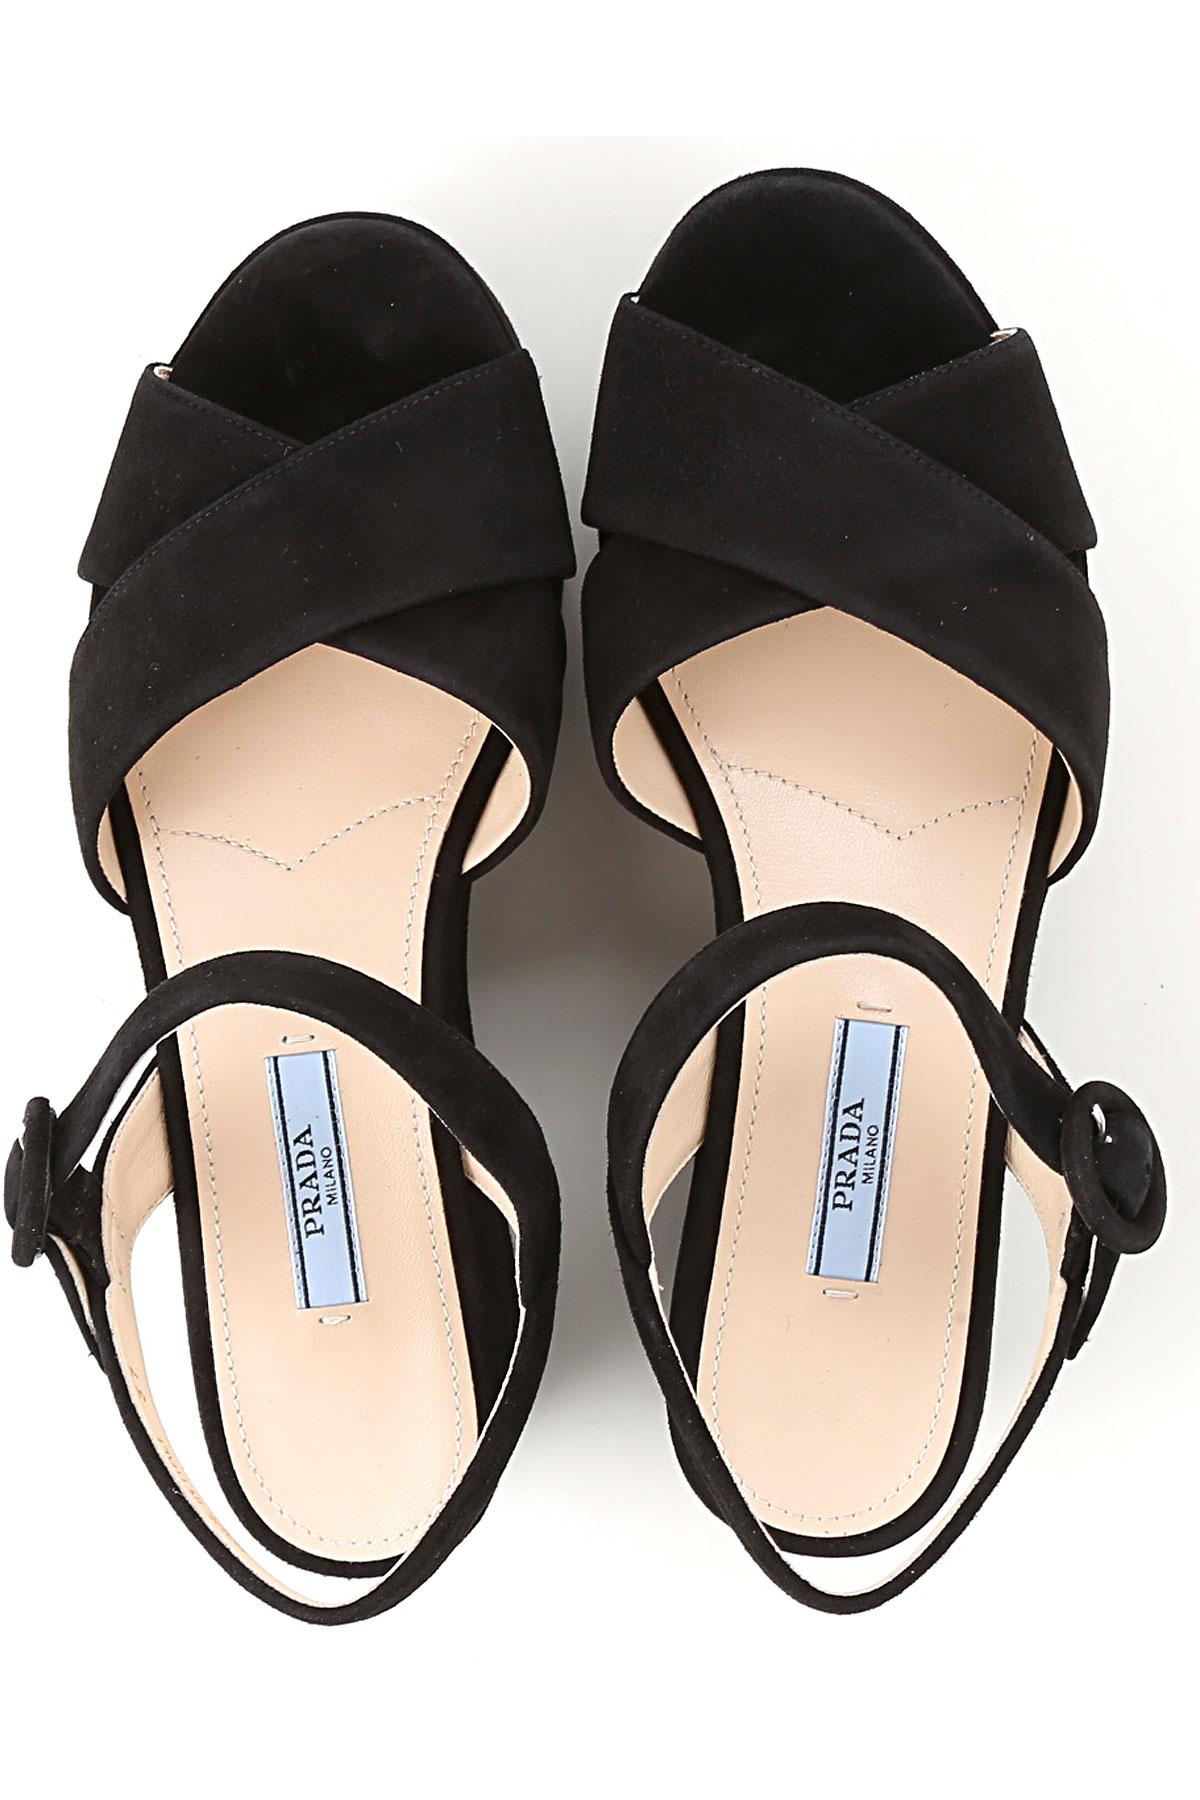 Zapatos Mujer verano Negro nbsp; Primavera Prada Para 2019 1HFqwgwxd